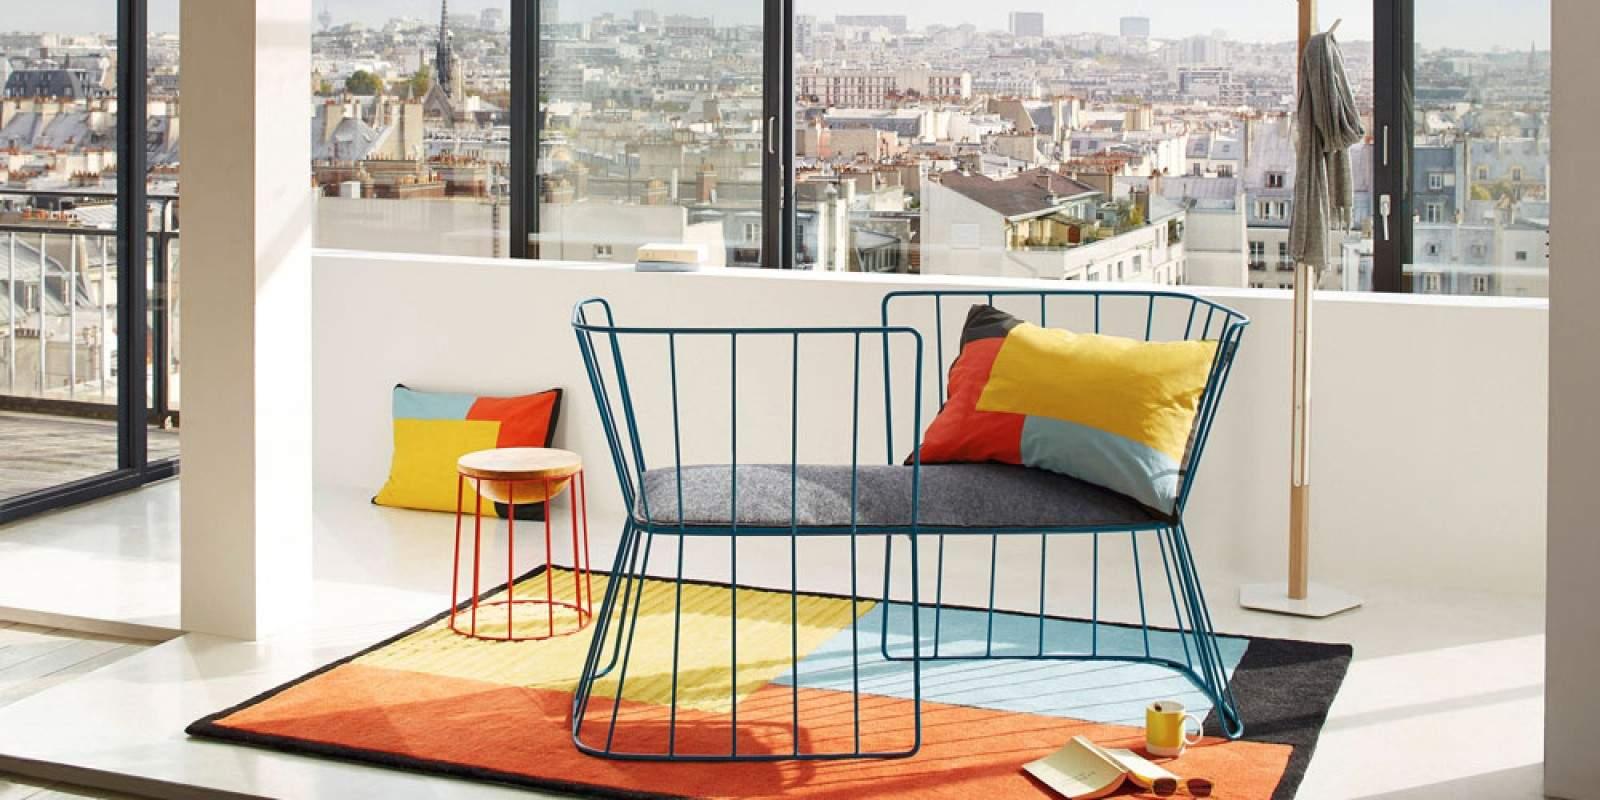 La redoute x gallery s bensimon printemps t 2015 jo yana for La redoute bensimon meubles